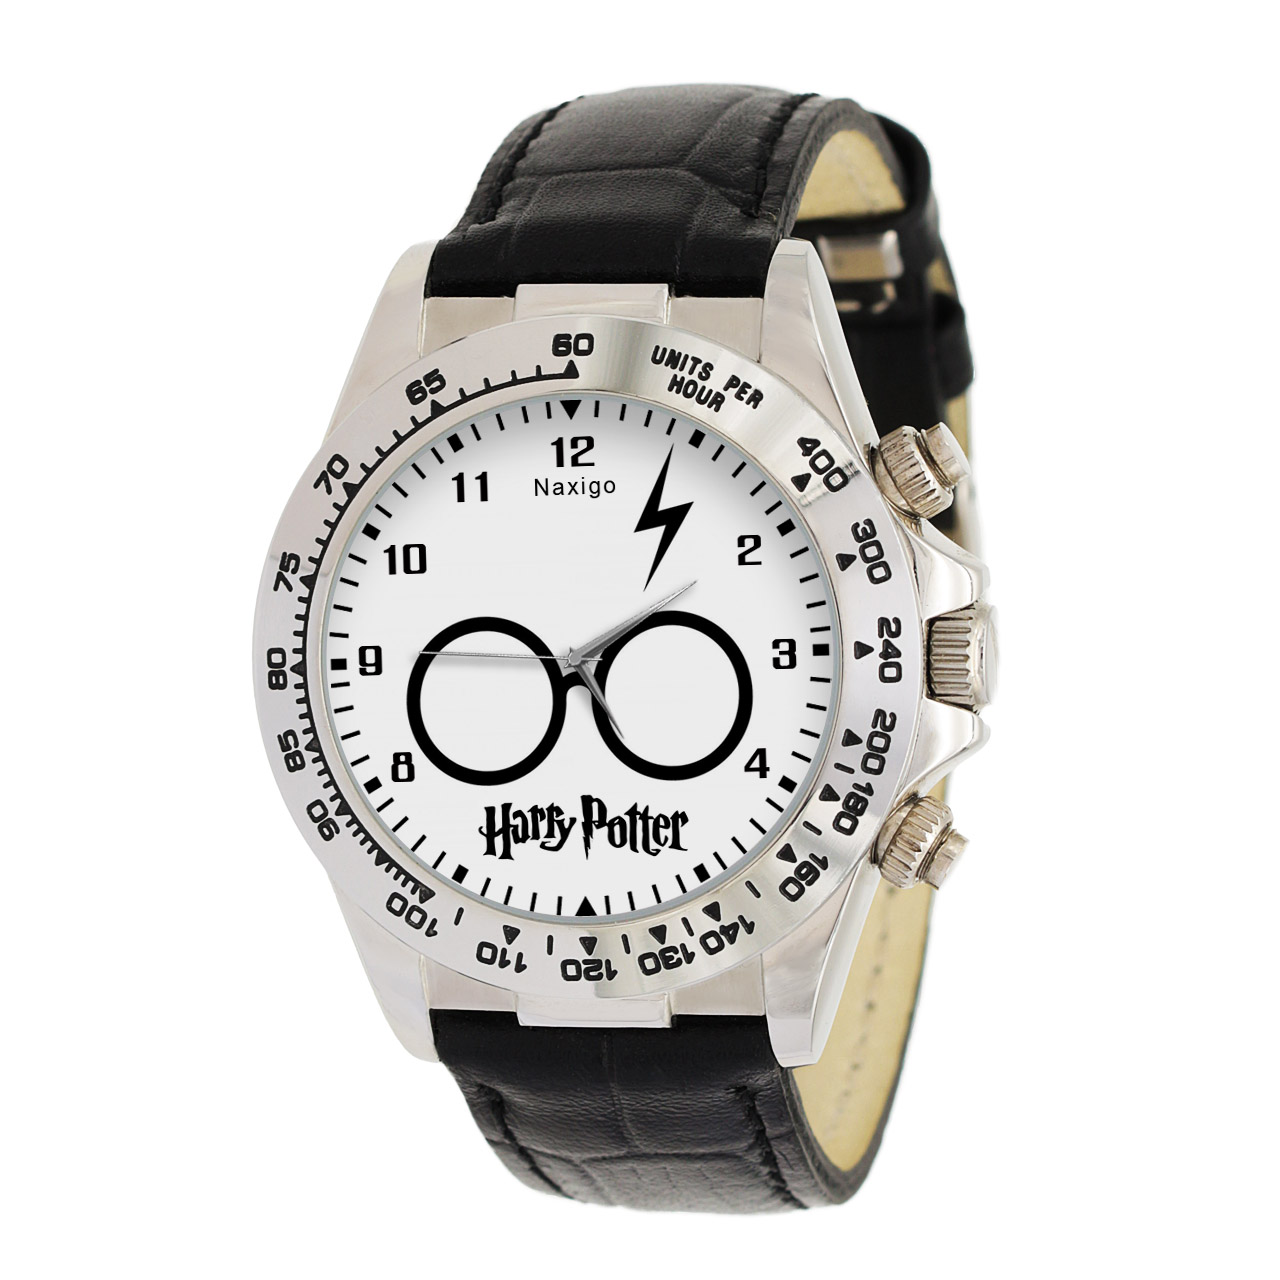 ساعت مچی  مردانه ناکسیگو طرح هری پاتر کد LS3562